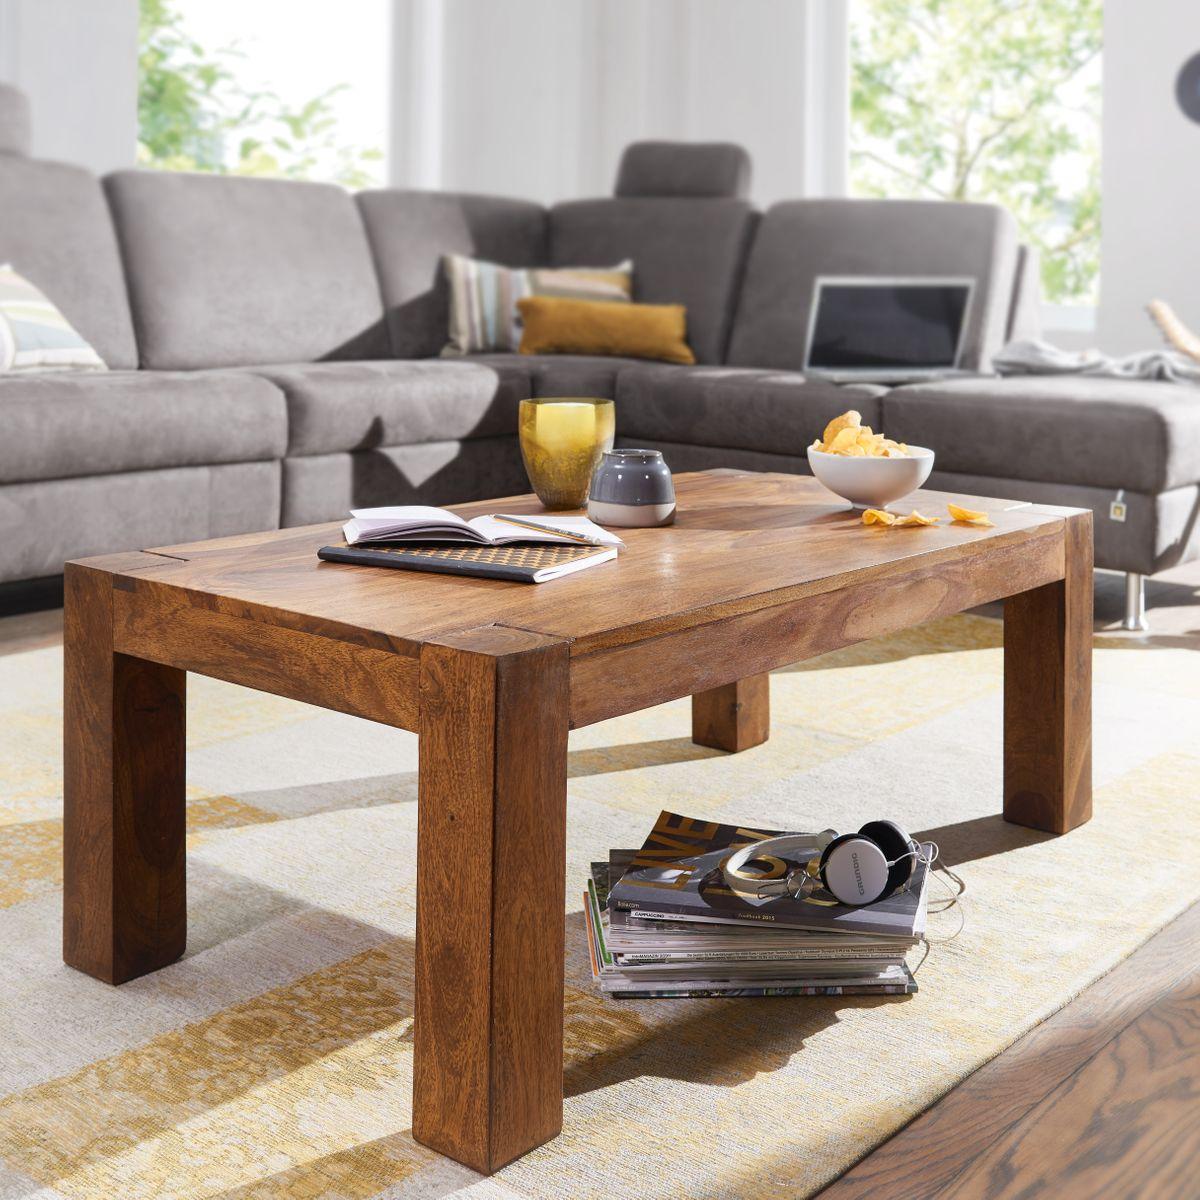 massiver couchtisch patan 110 x 60 x 40 cm holz massiv. Black Bedroom Furniture Sets. Home Design Ideas